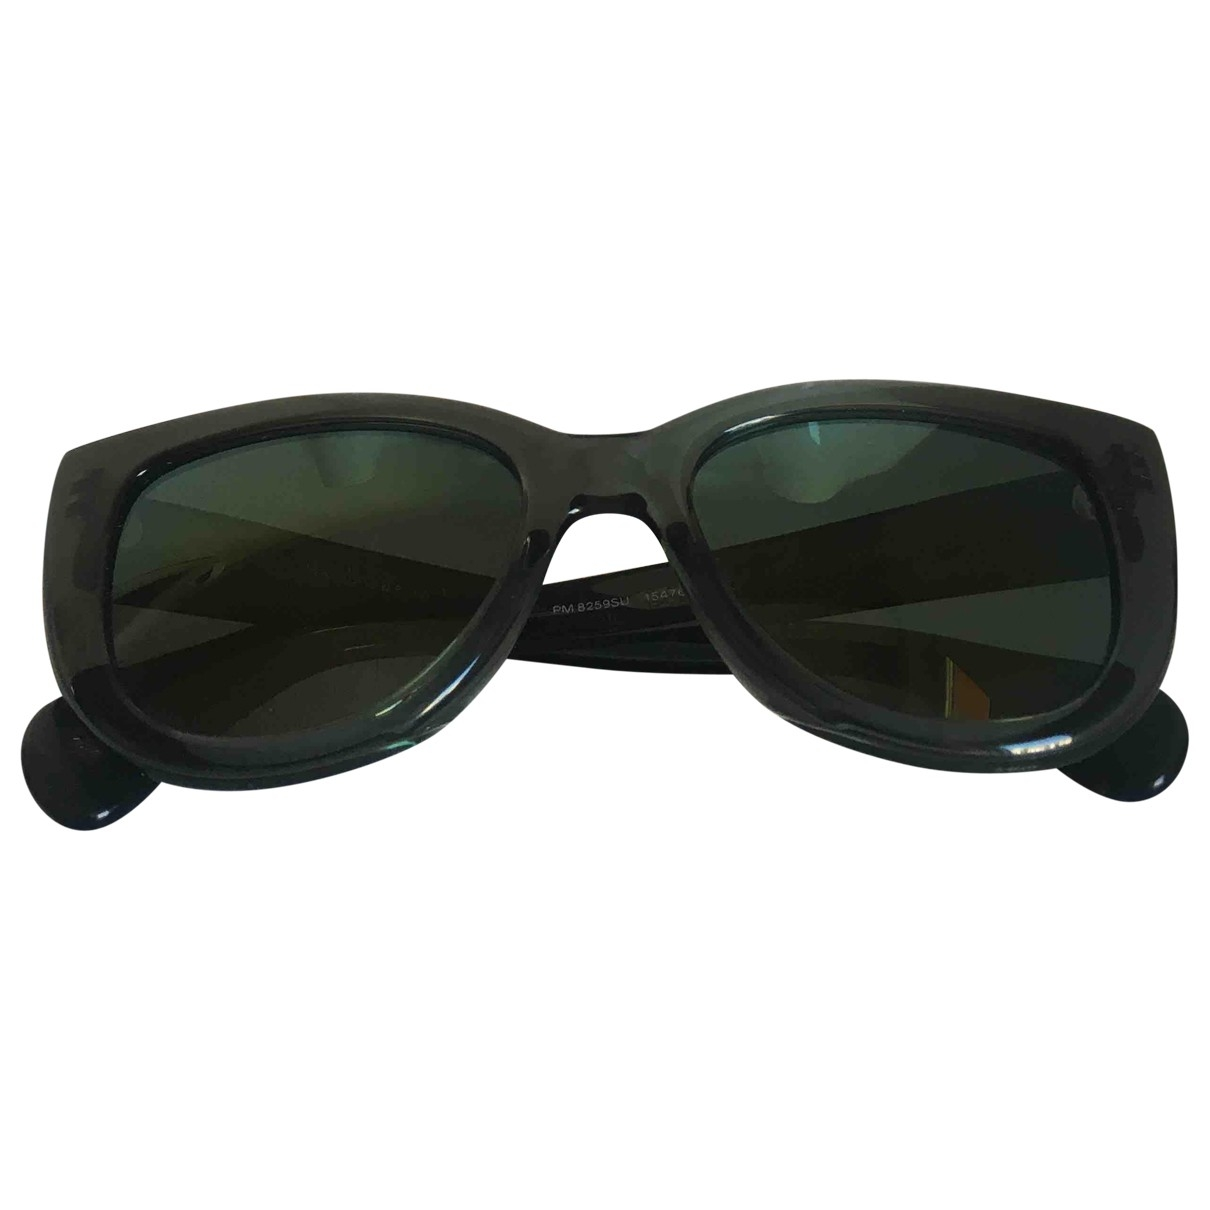 Paul Smith \N Sonnenbrillen in  Gruen Kunststoff